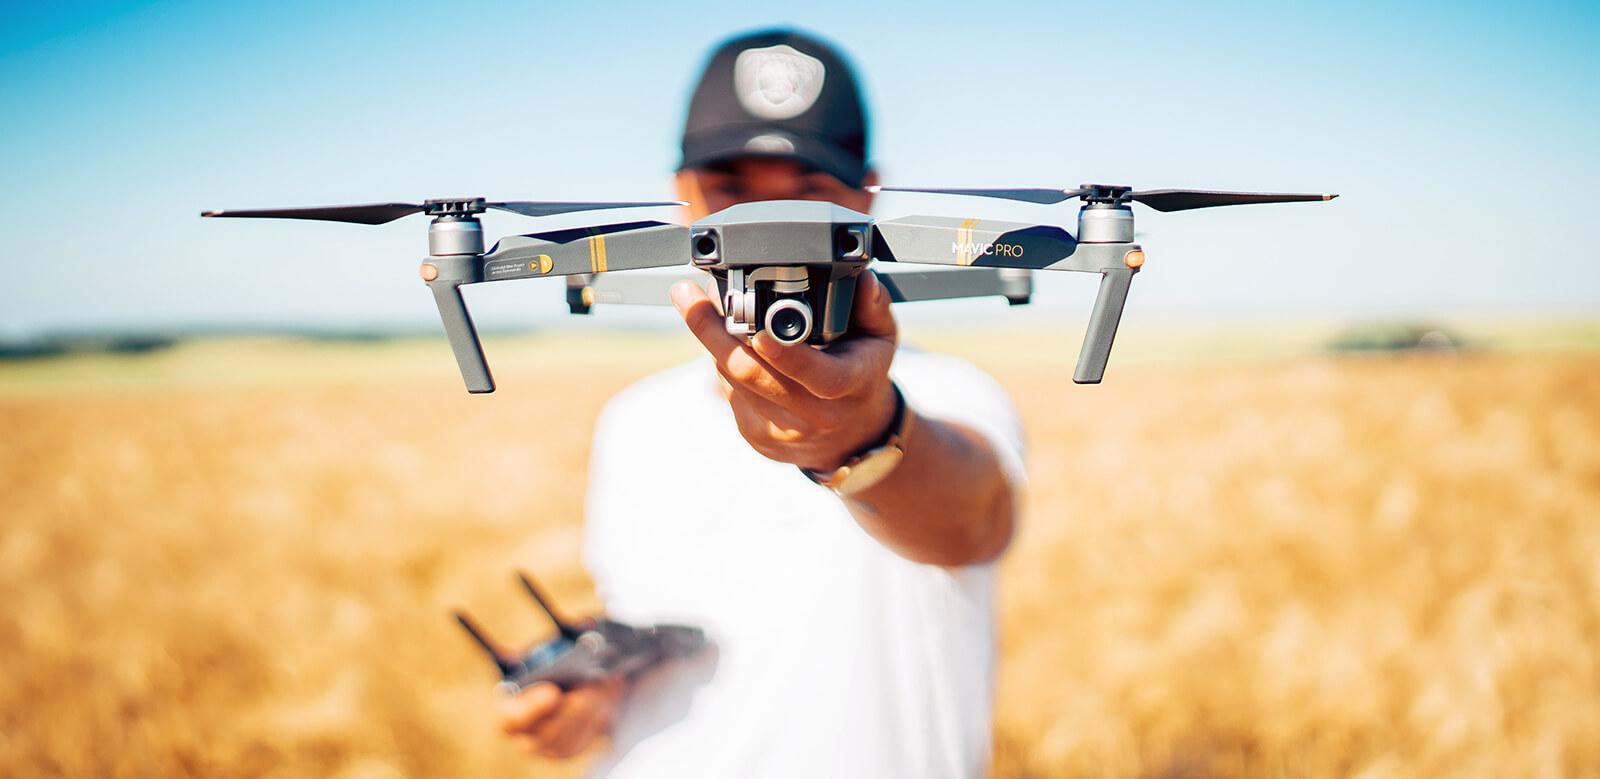 DroneMainEdited.jpg